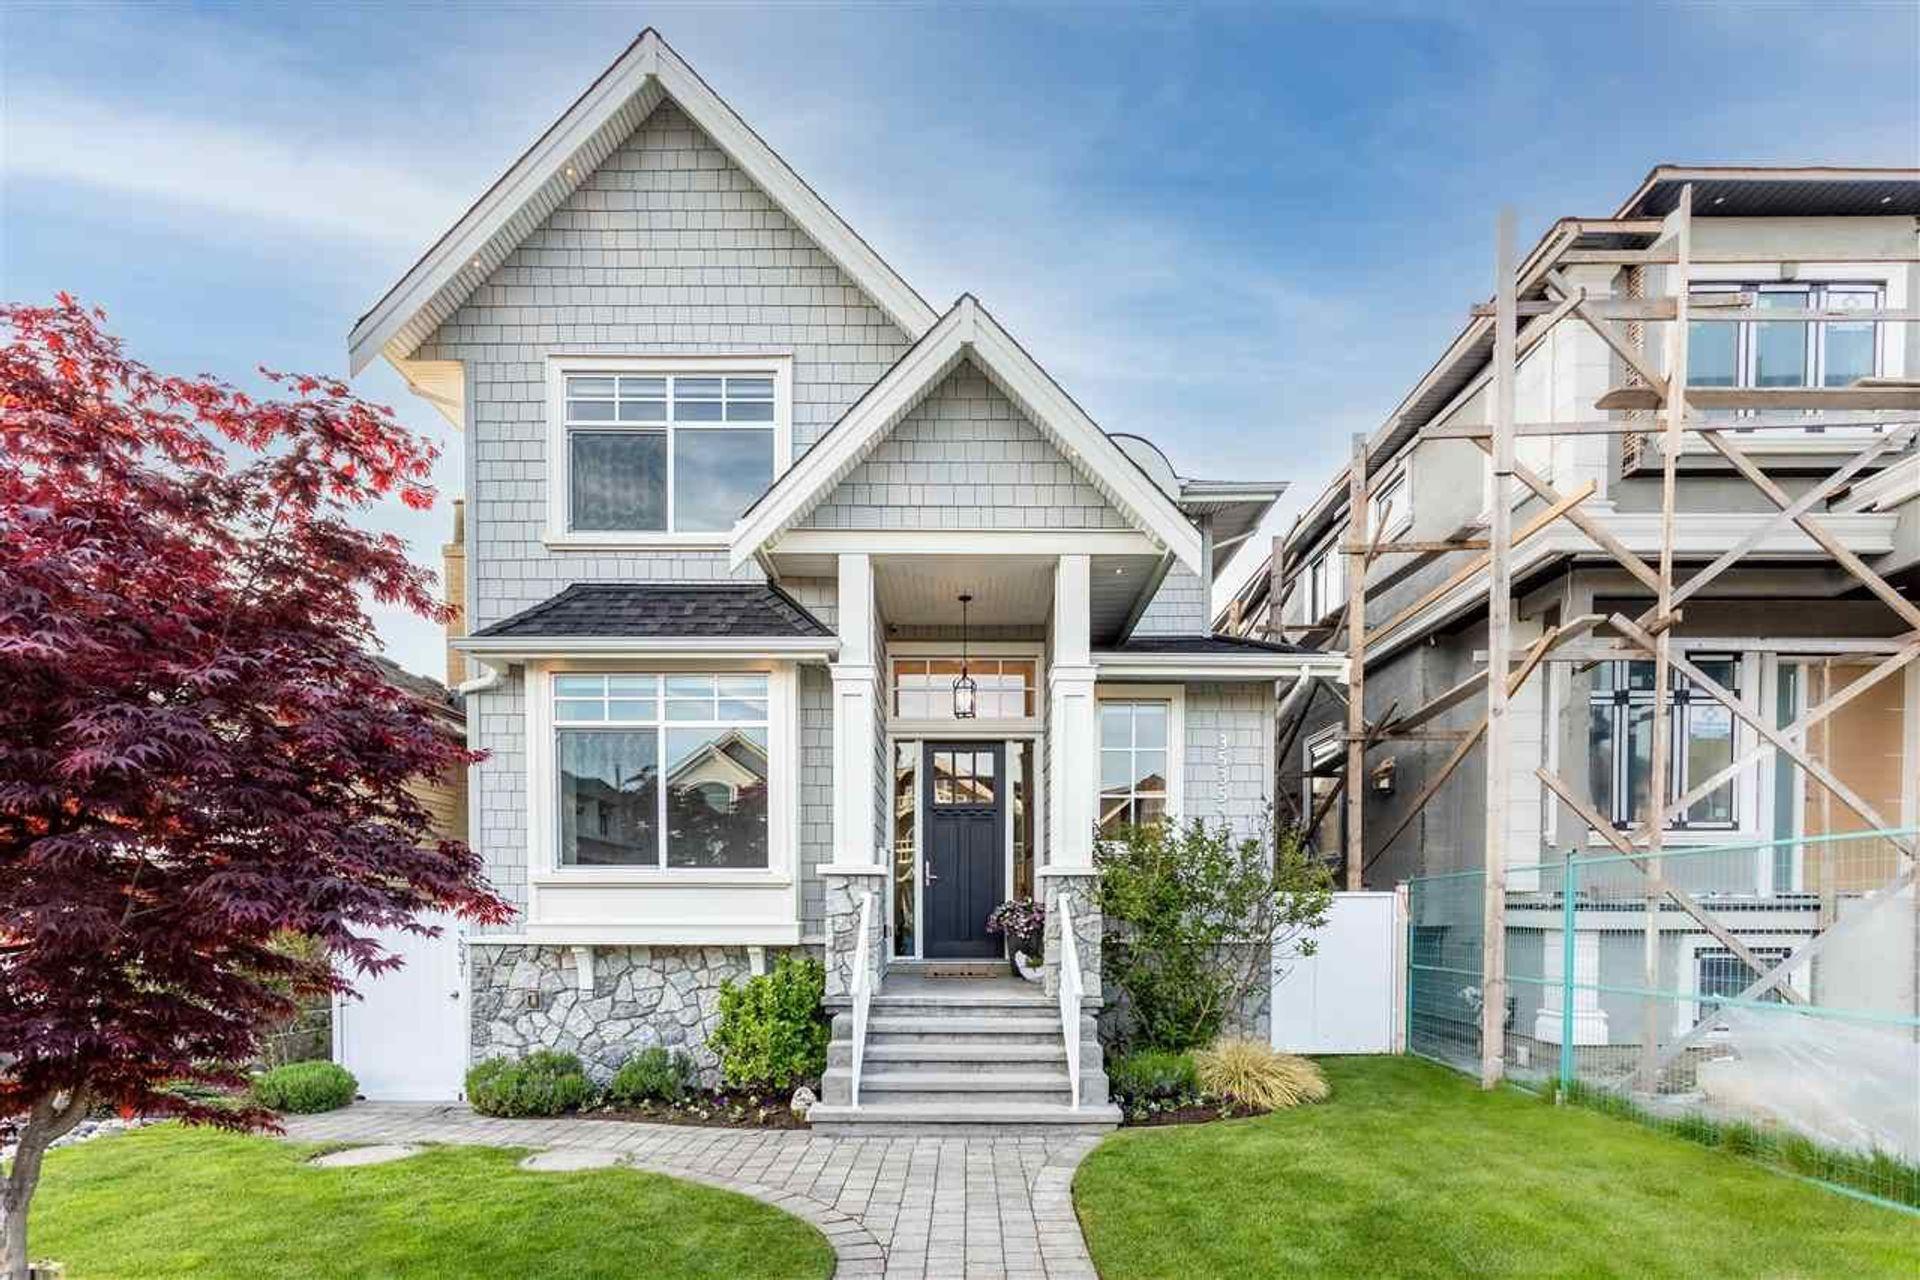 3535-dundas-street-hastings-sunrise-vancouver-east-02 at 3535 Dundas Street, Hastings Sunrise, Vancouver East